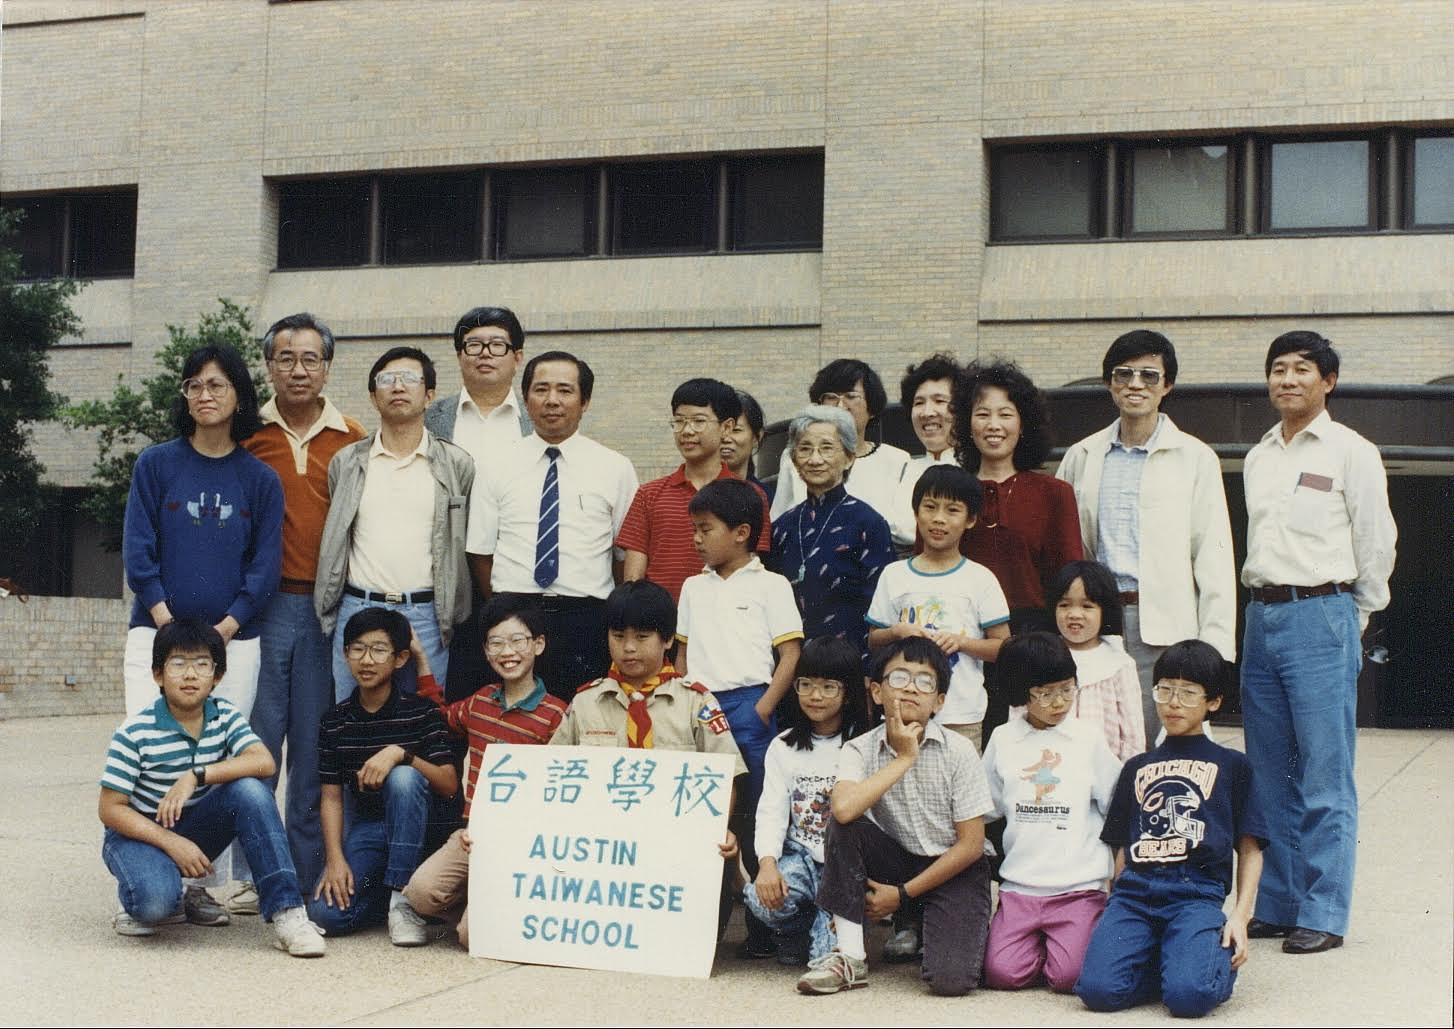 8. Austin Taiwanese School (Texas) 德州奧斯汀台語學校